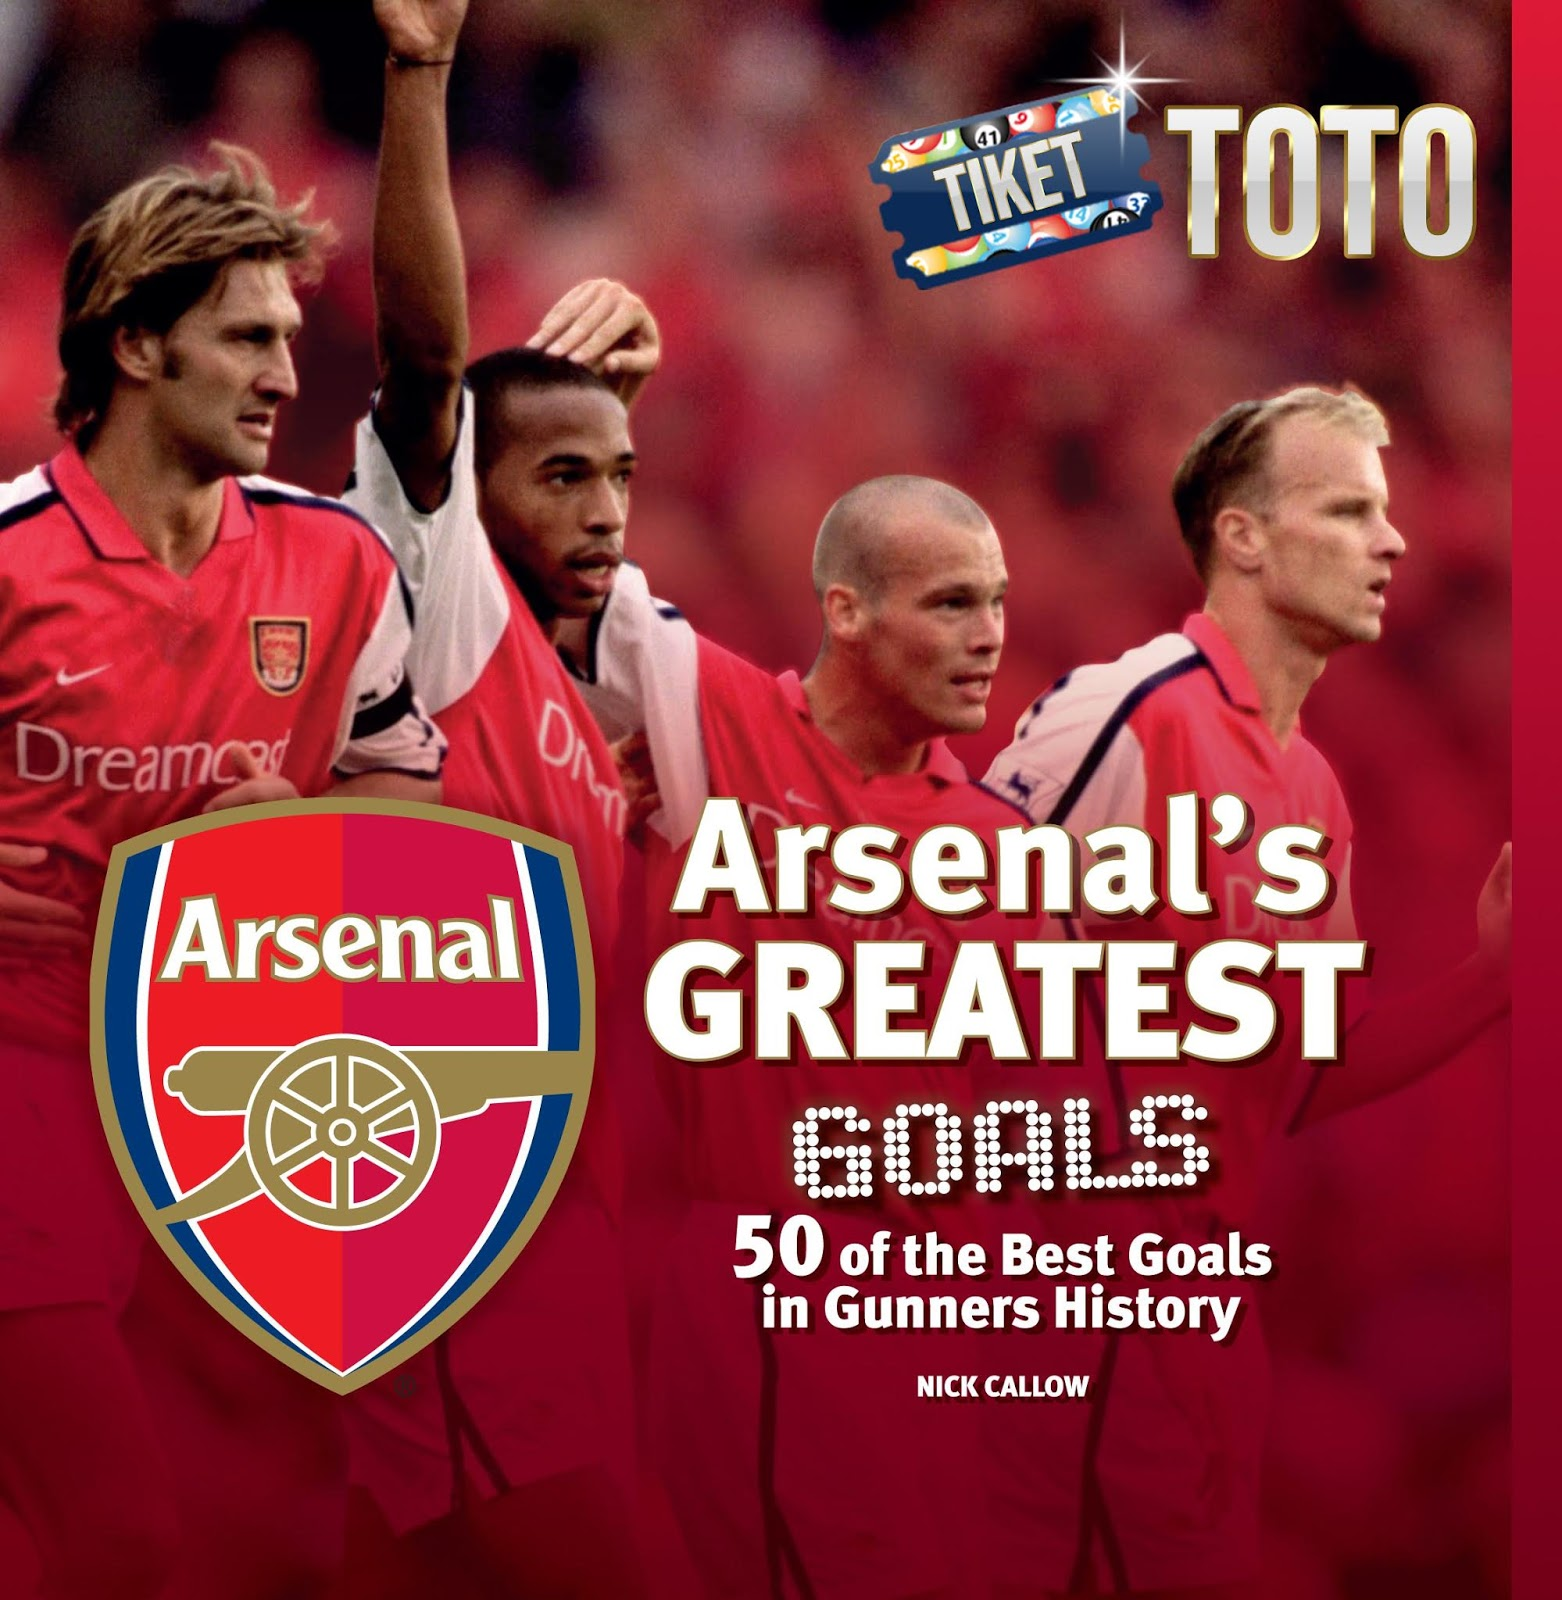 Ikuti Jejak Manchester United, Arsenal Kembalikan Uang Suporter